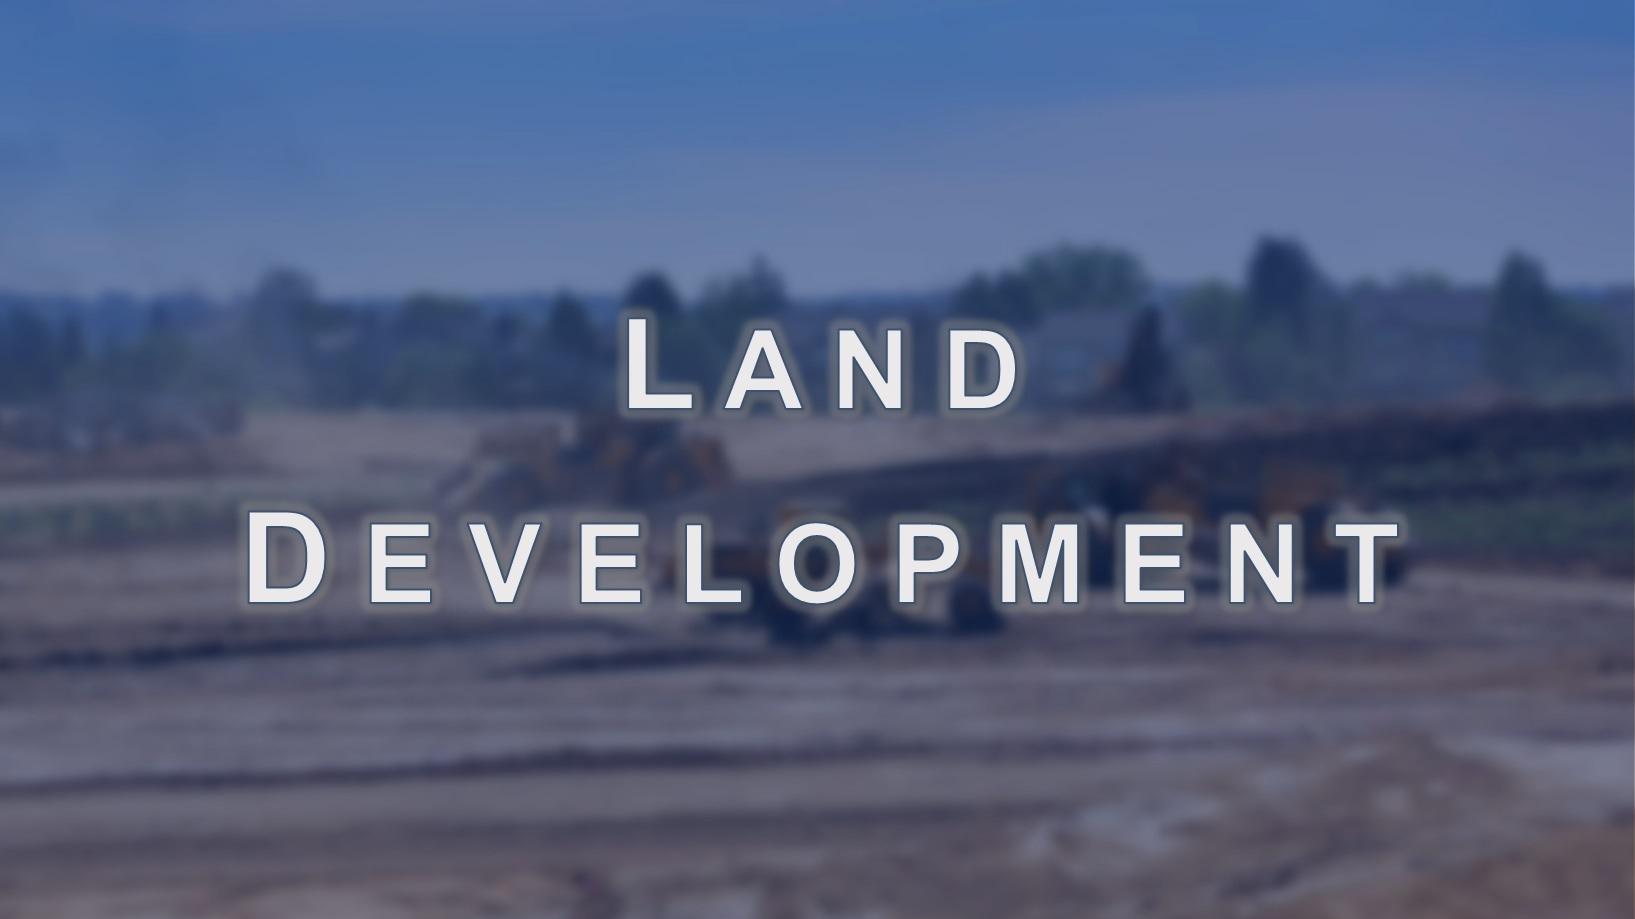 10. Land Development